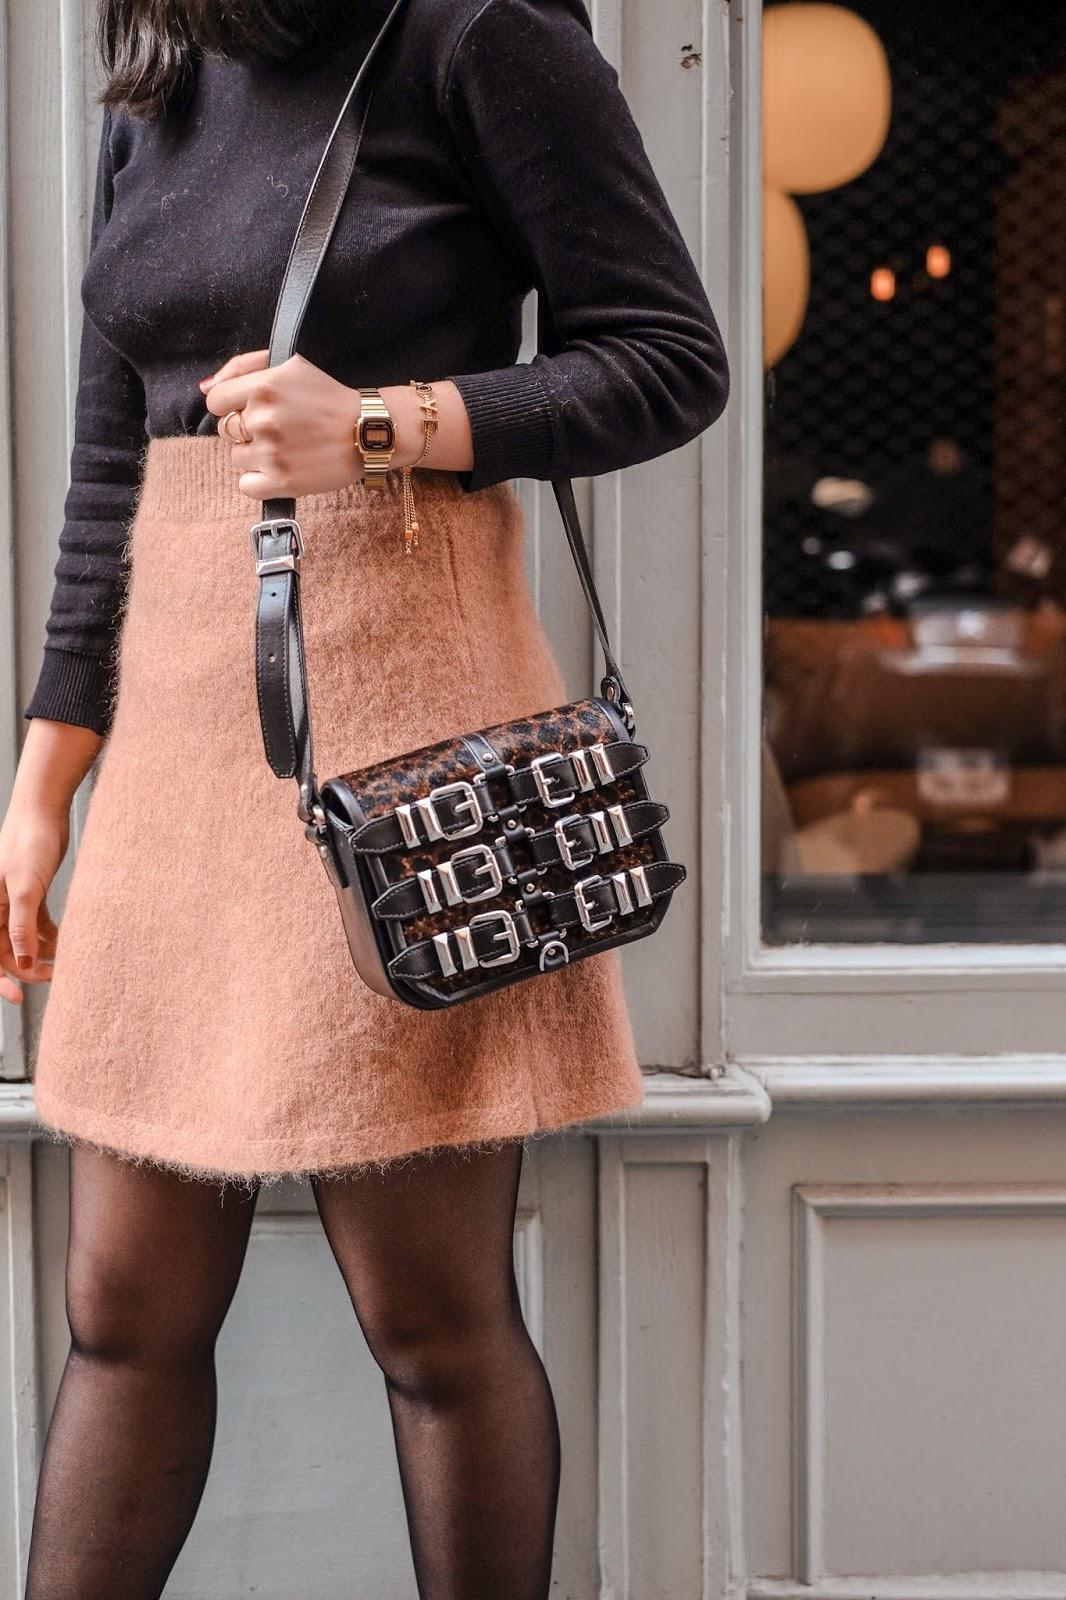 blog mode lyon, blogueuse lyonnaise, blogueuse à lyon, blogueuse mode, ameni daily, amenidaily, cos, cos store, modeuse